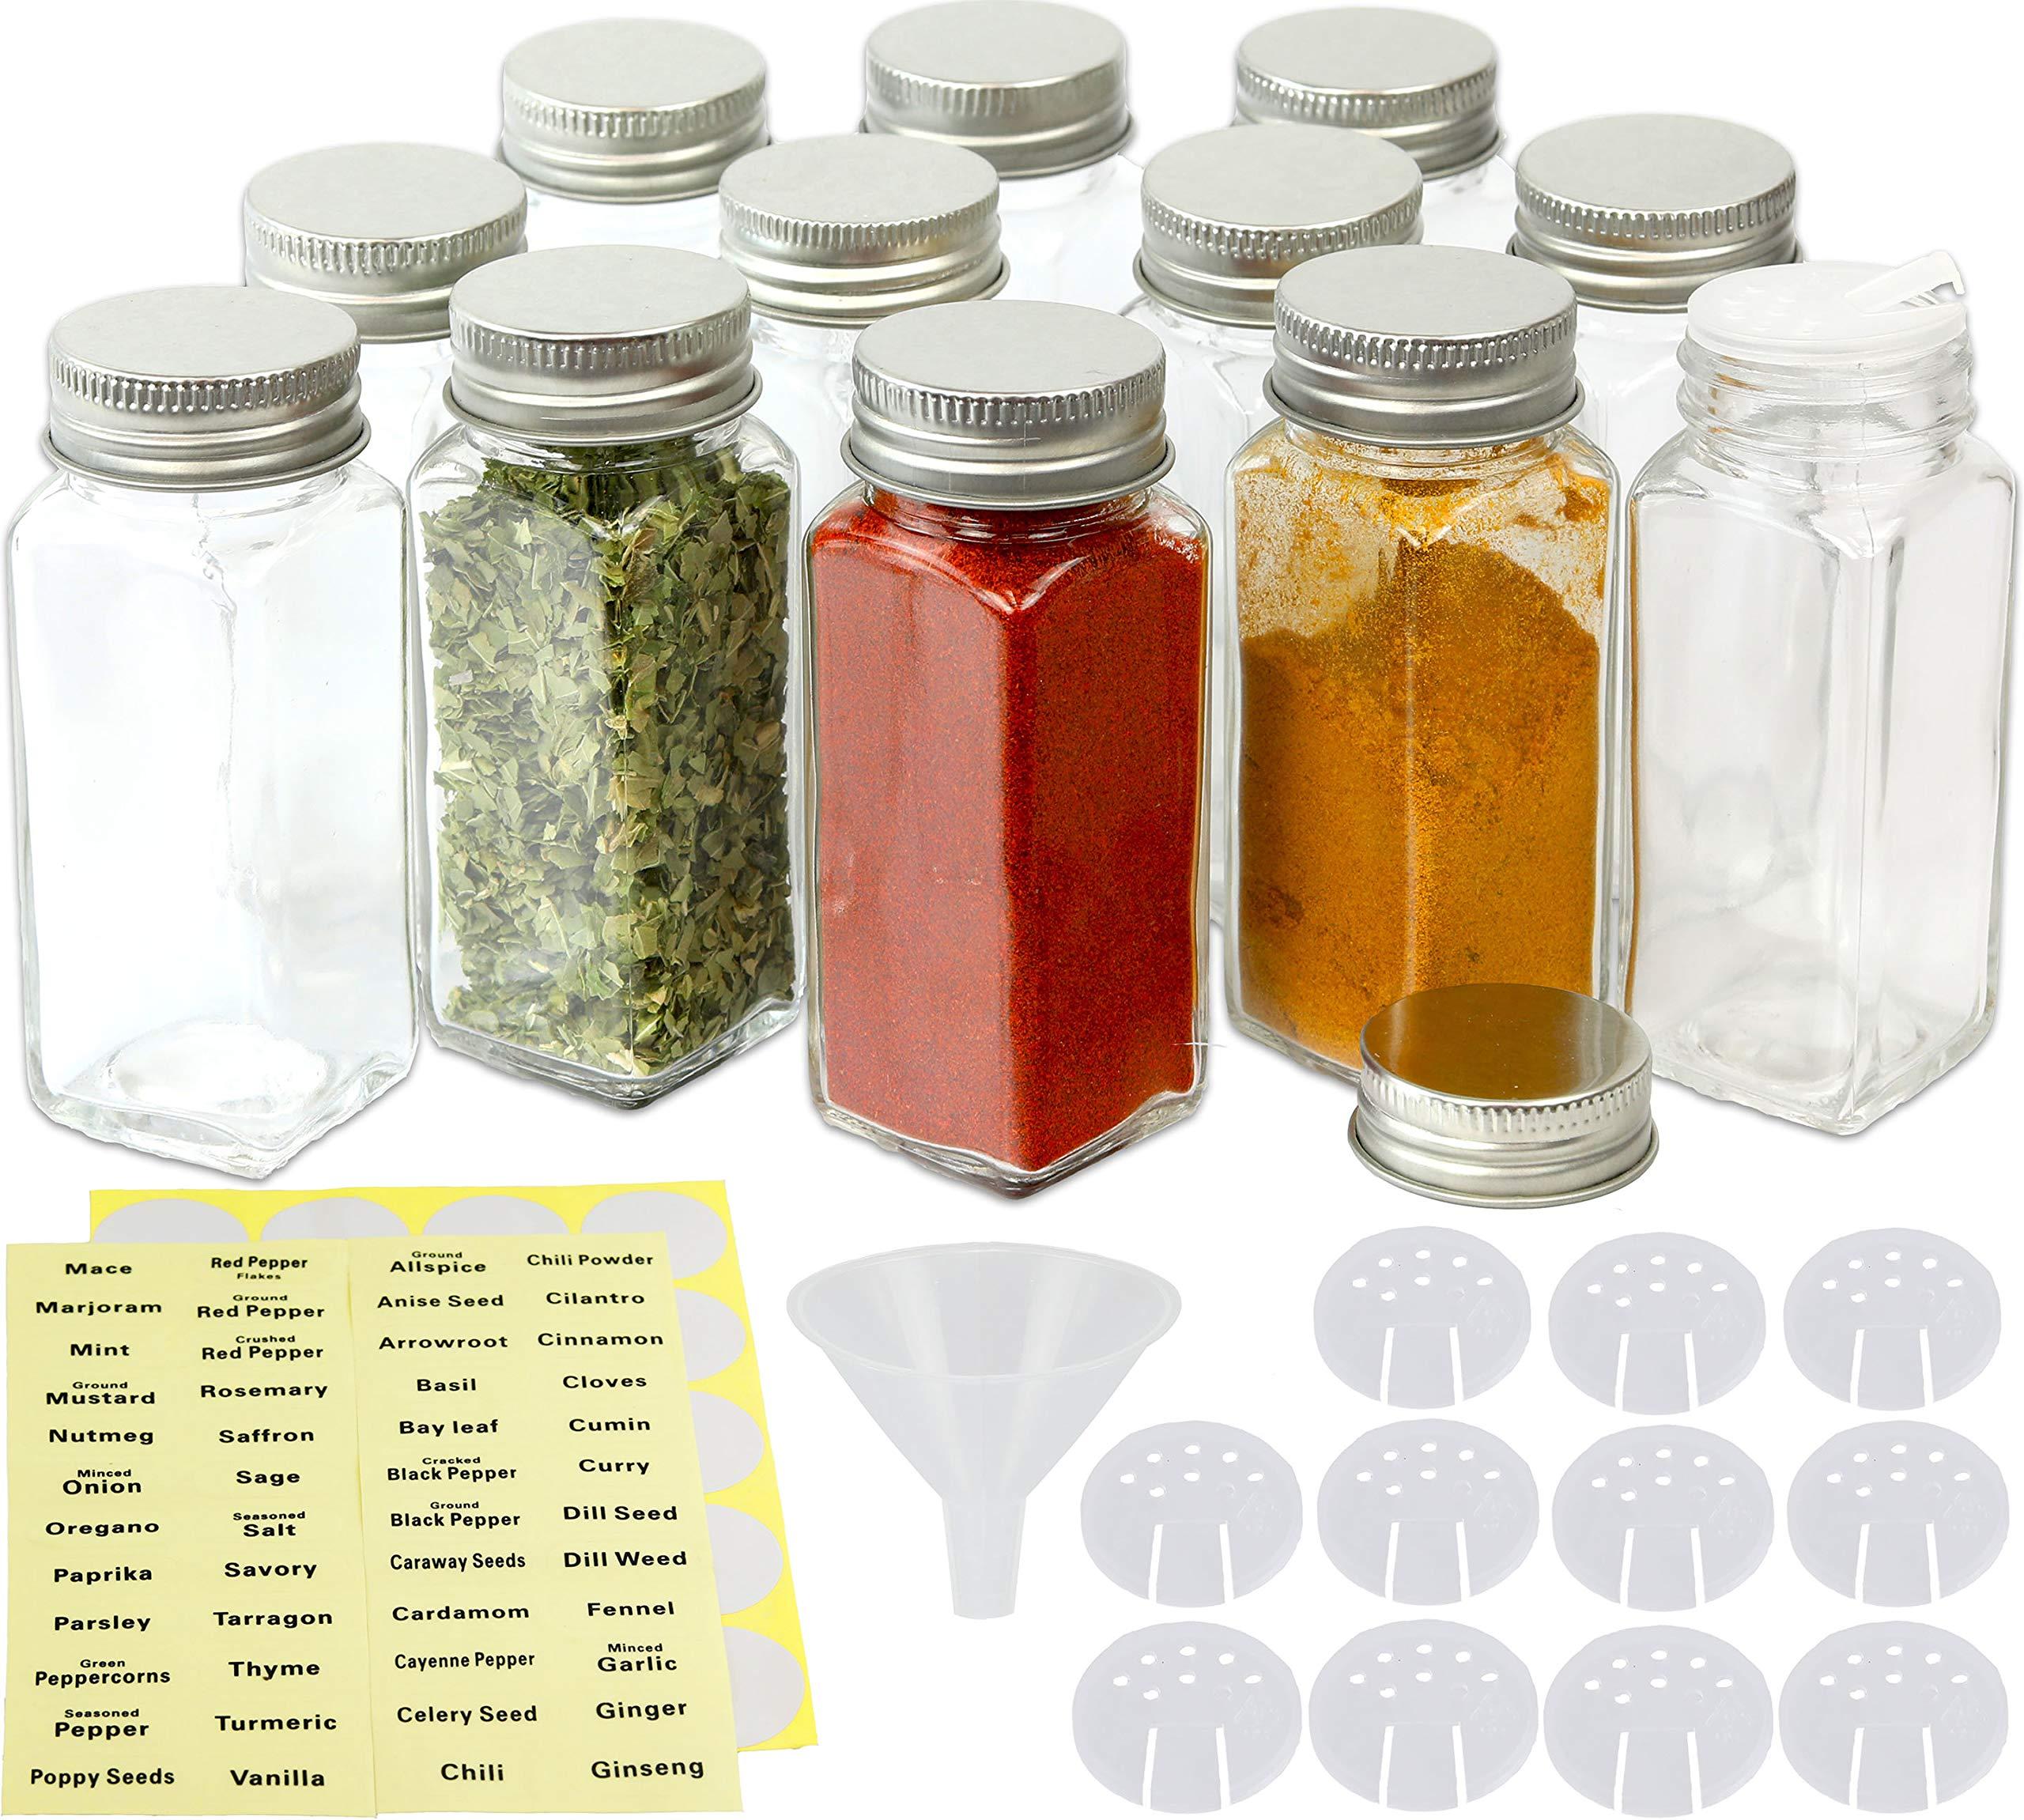 SimpleHouseware 12 Square Spice Bottles (4oz) w/label Set by Simple Houseware